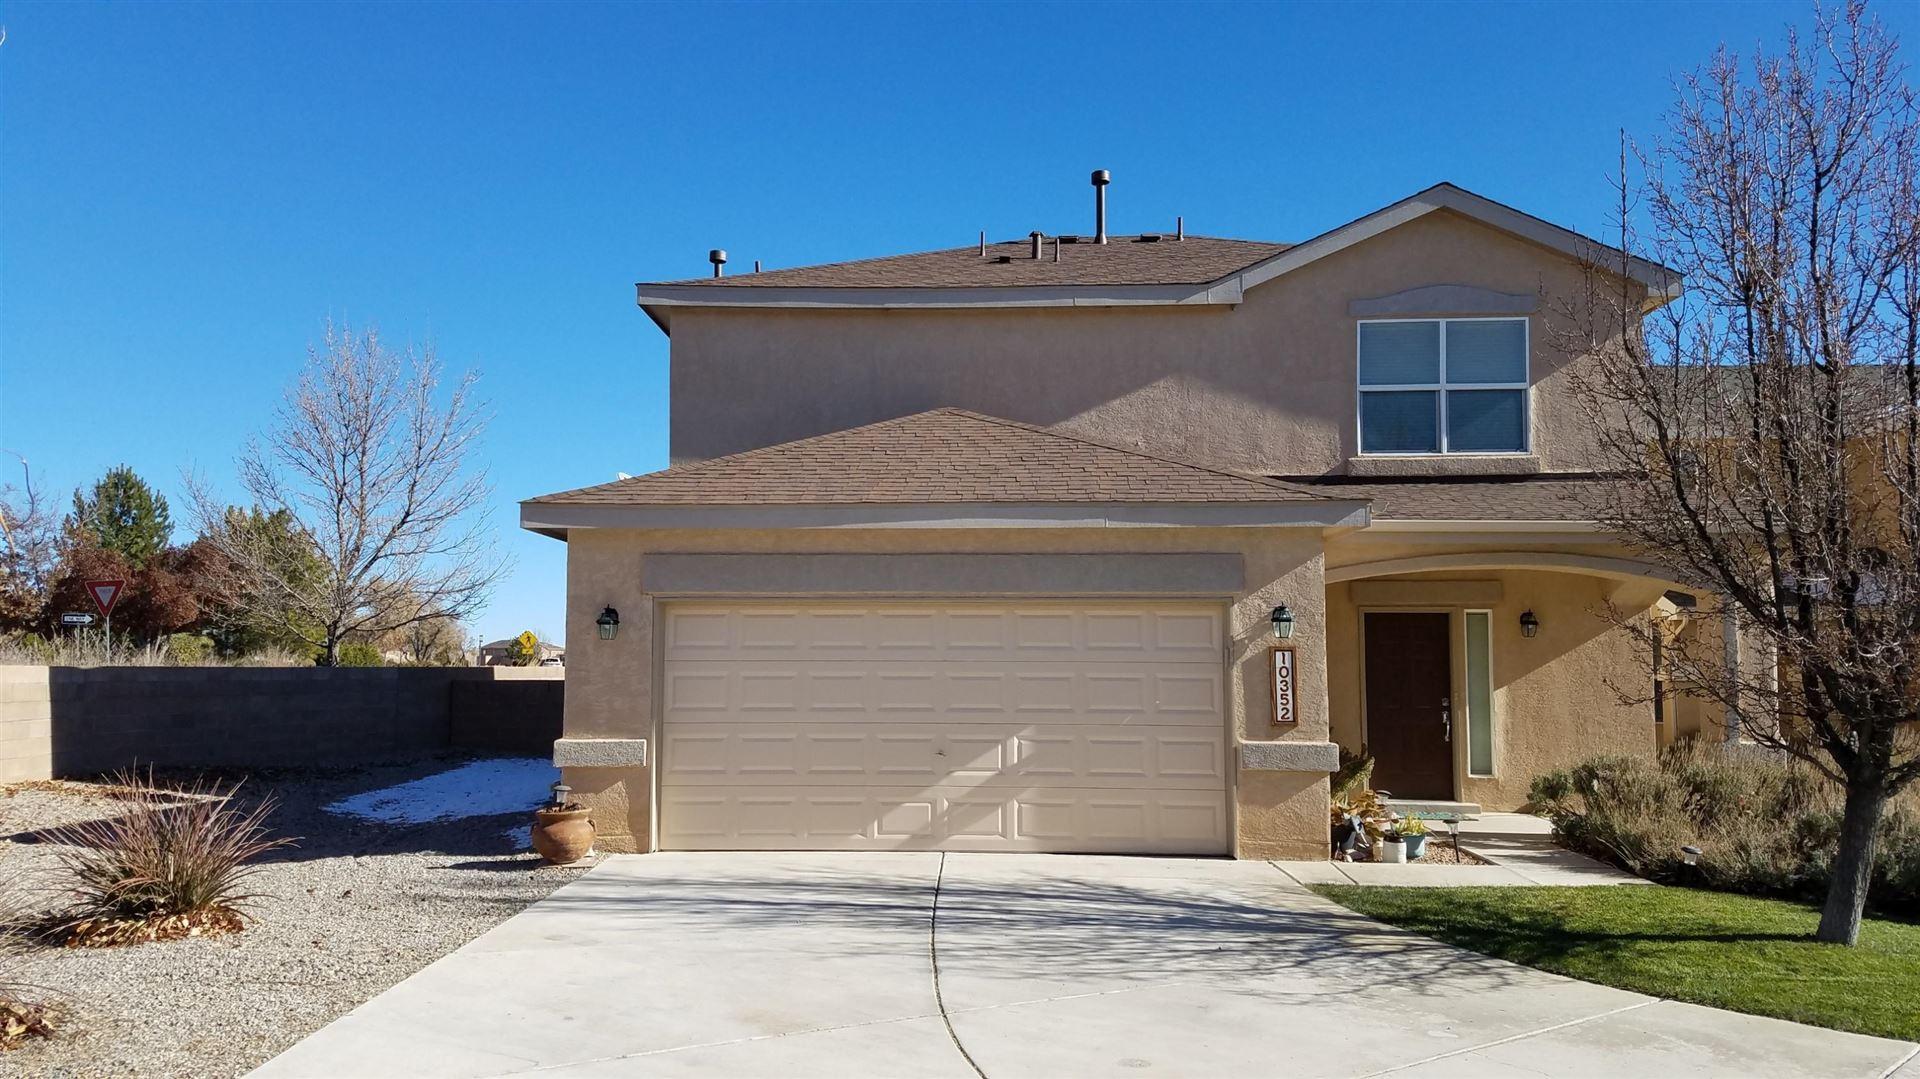 10352 MOGOLLON Drive NW, Albuquerque, NM 87114 - MLS#: 983569